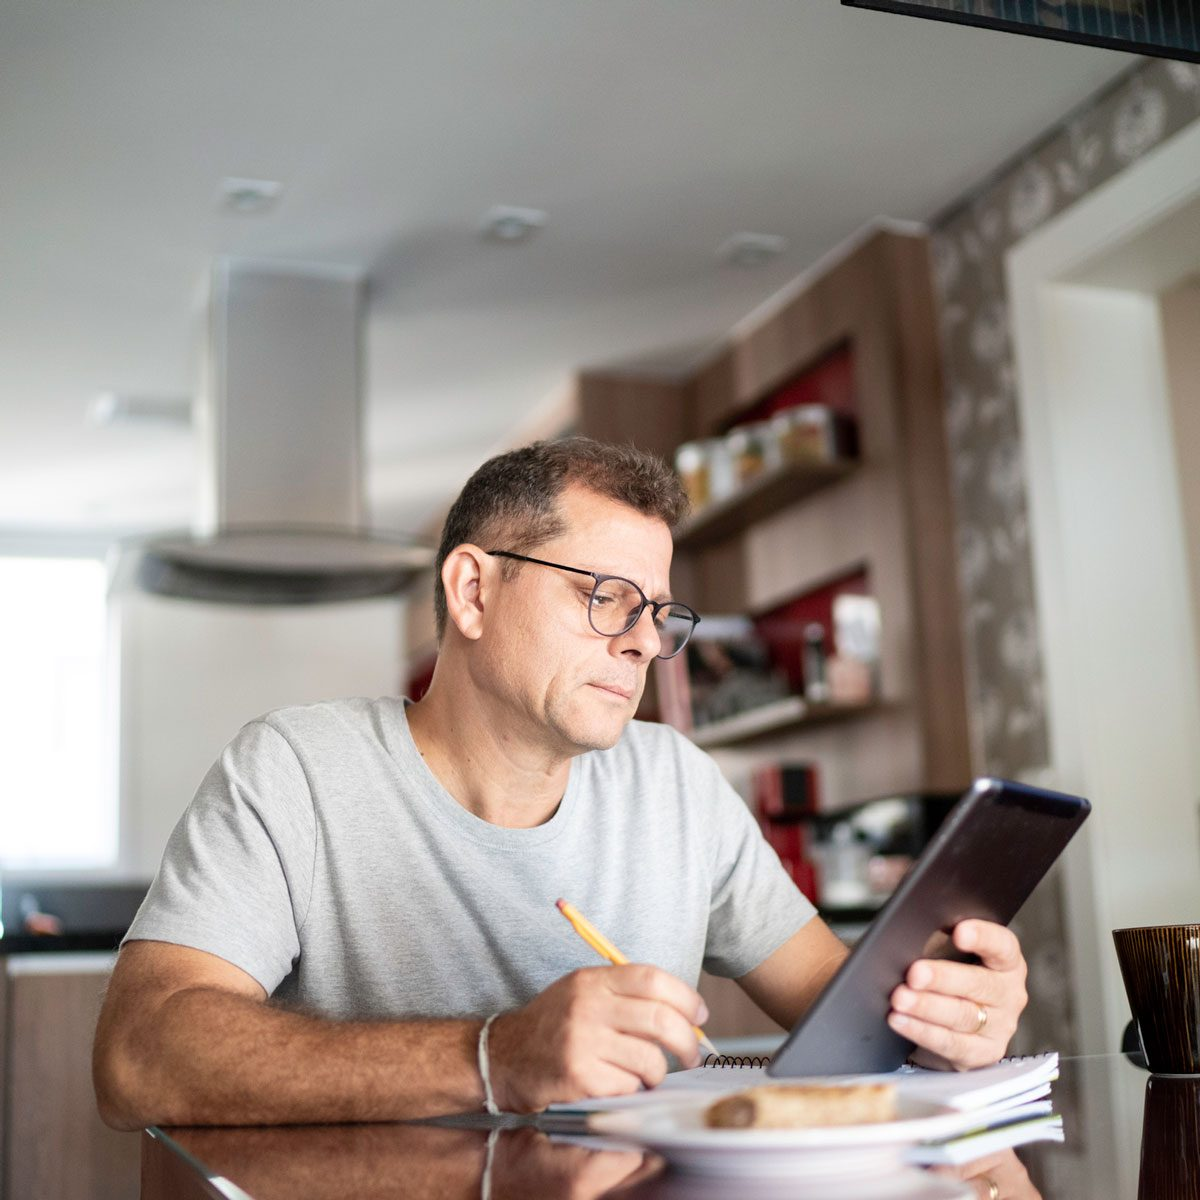 The Best Reddit Home Improvement Tips The Family Handyman